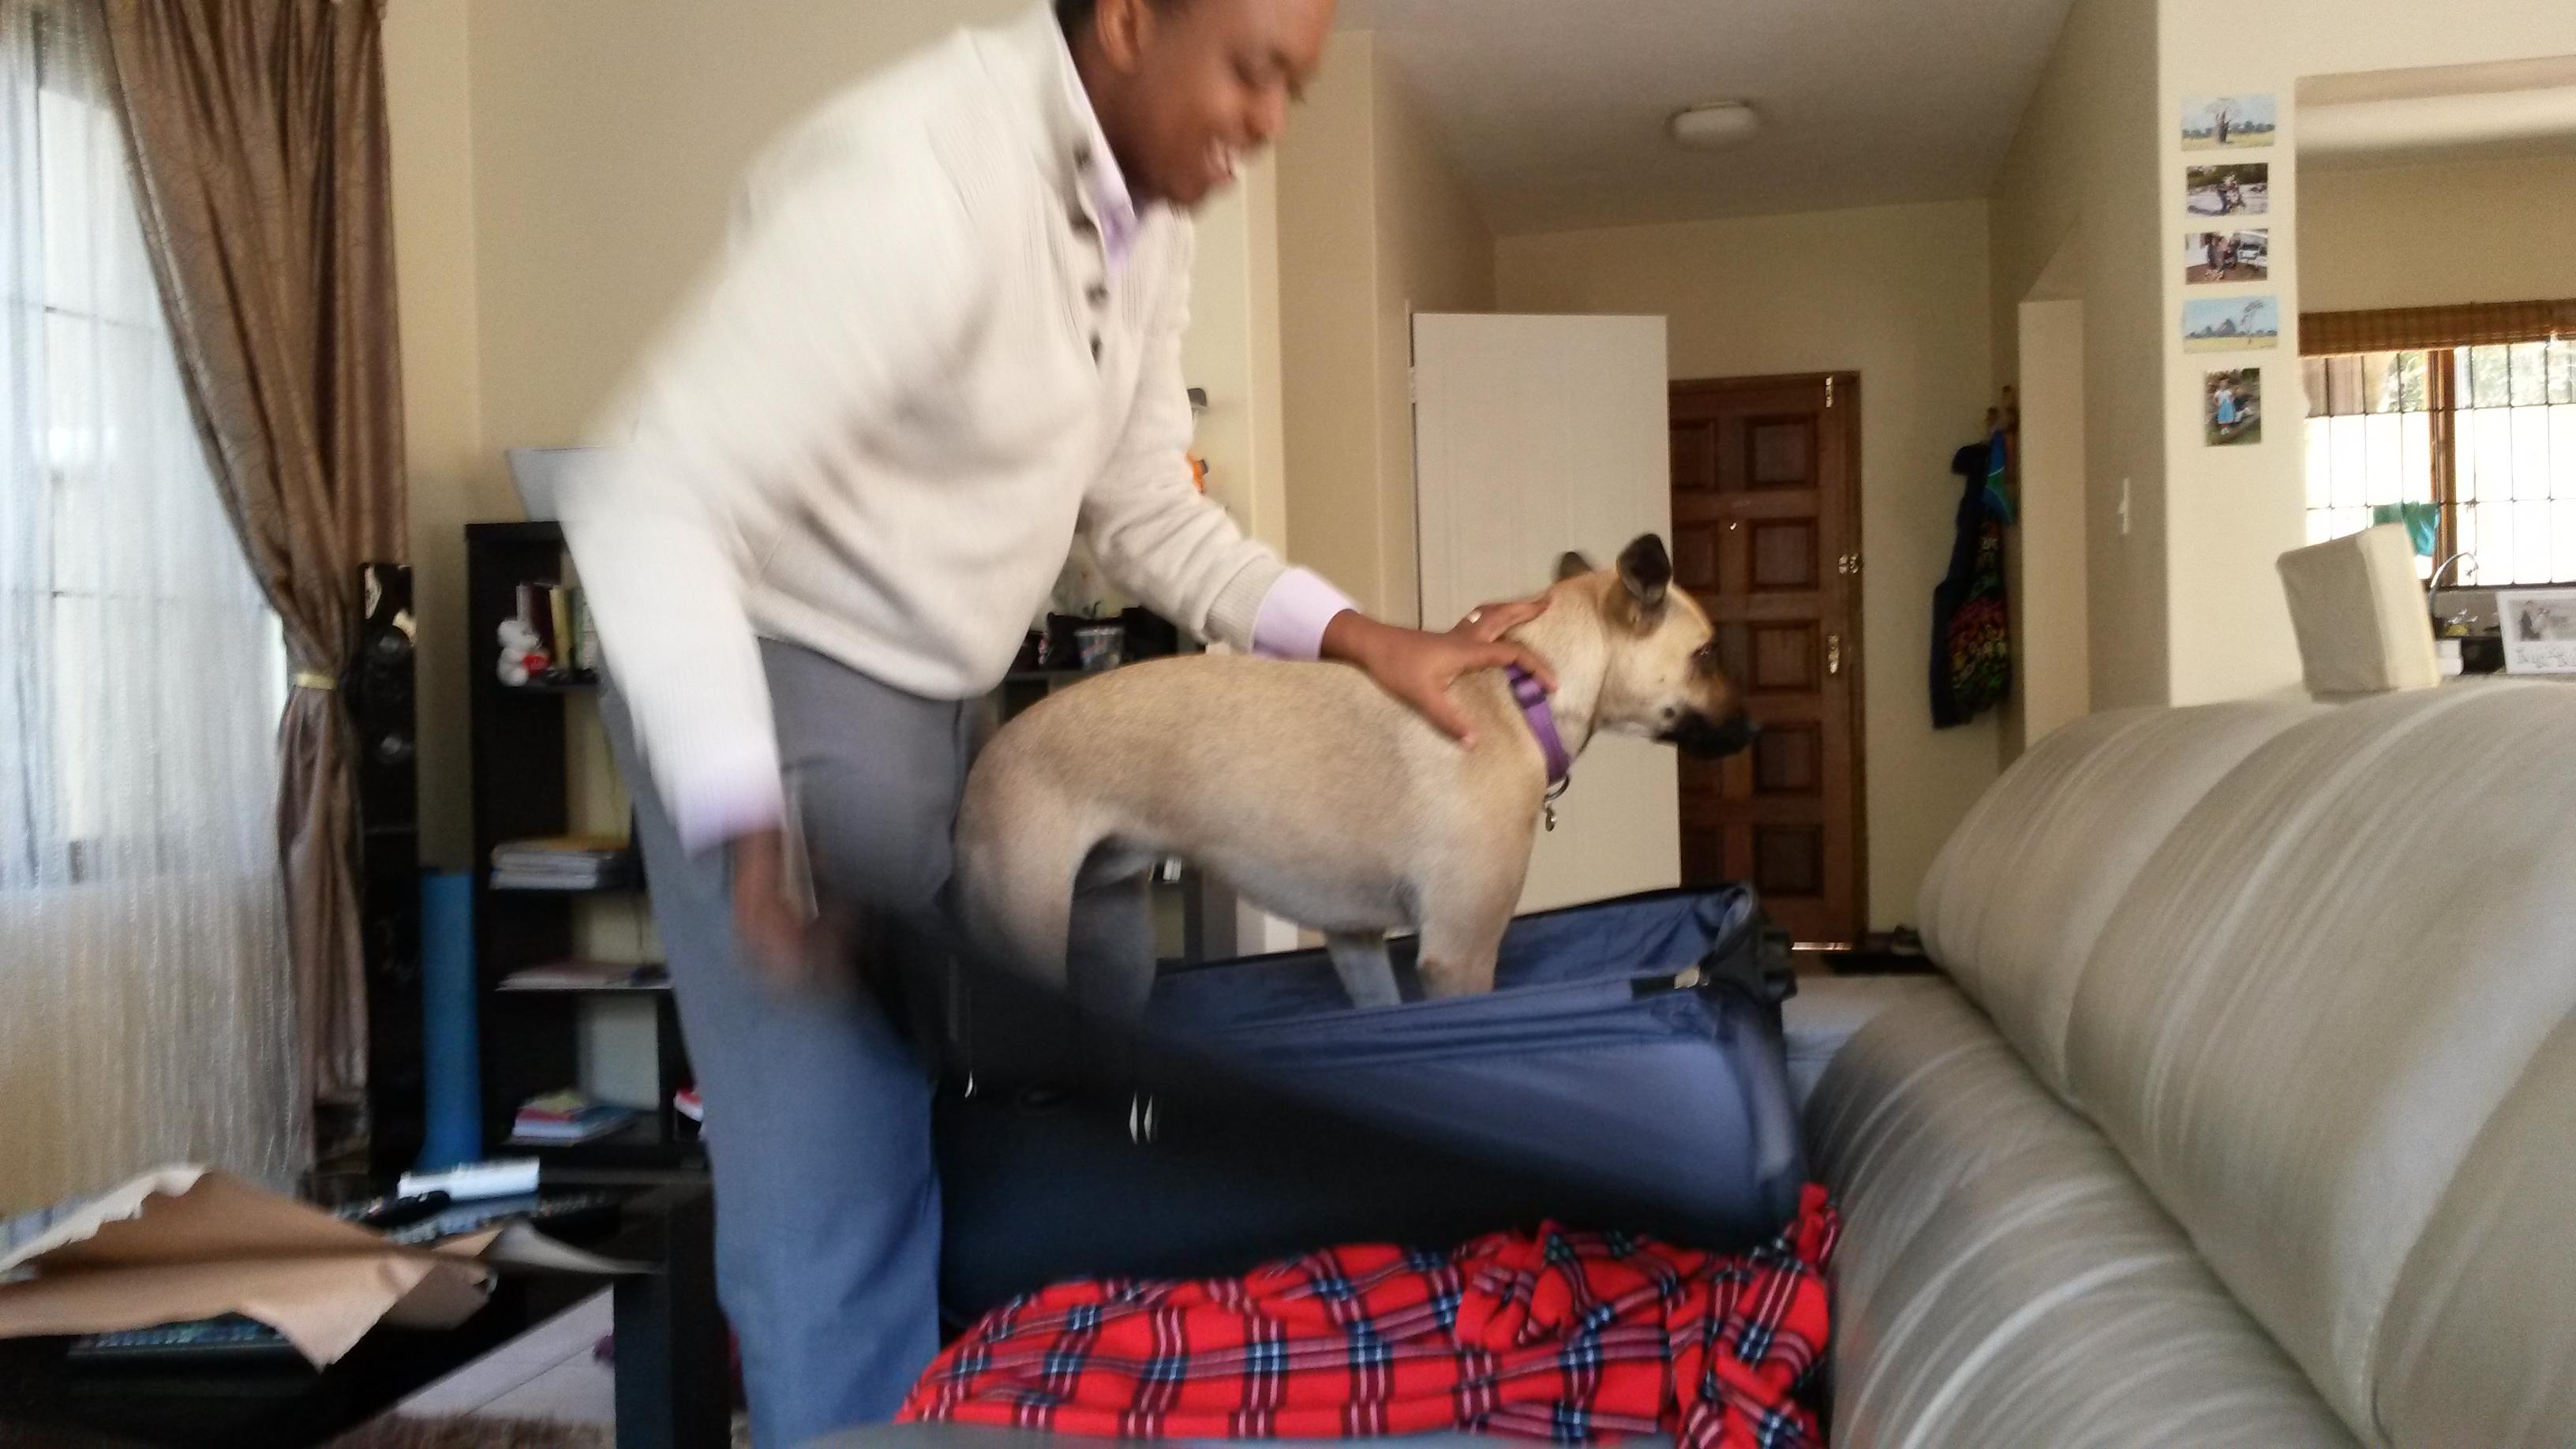 amazon comforter com supplies nylon a blue get pet guardian muzzles how gear to lined muzzle size snout dp fashion comfort dog inch